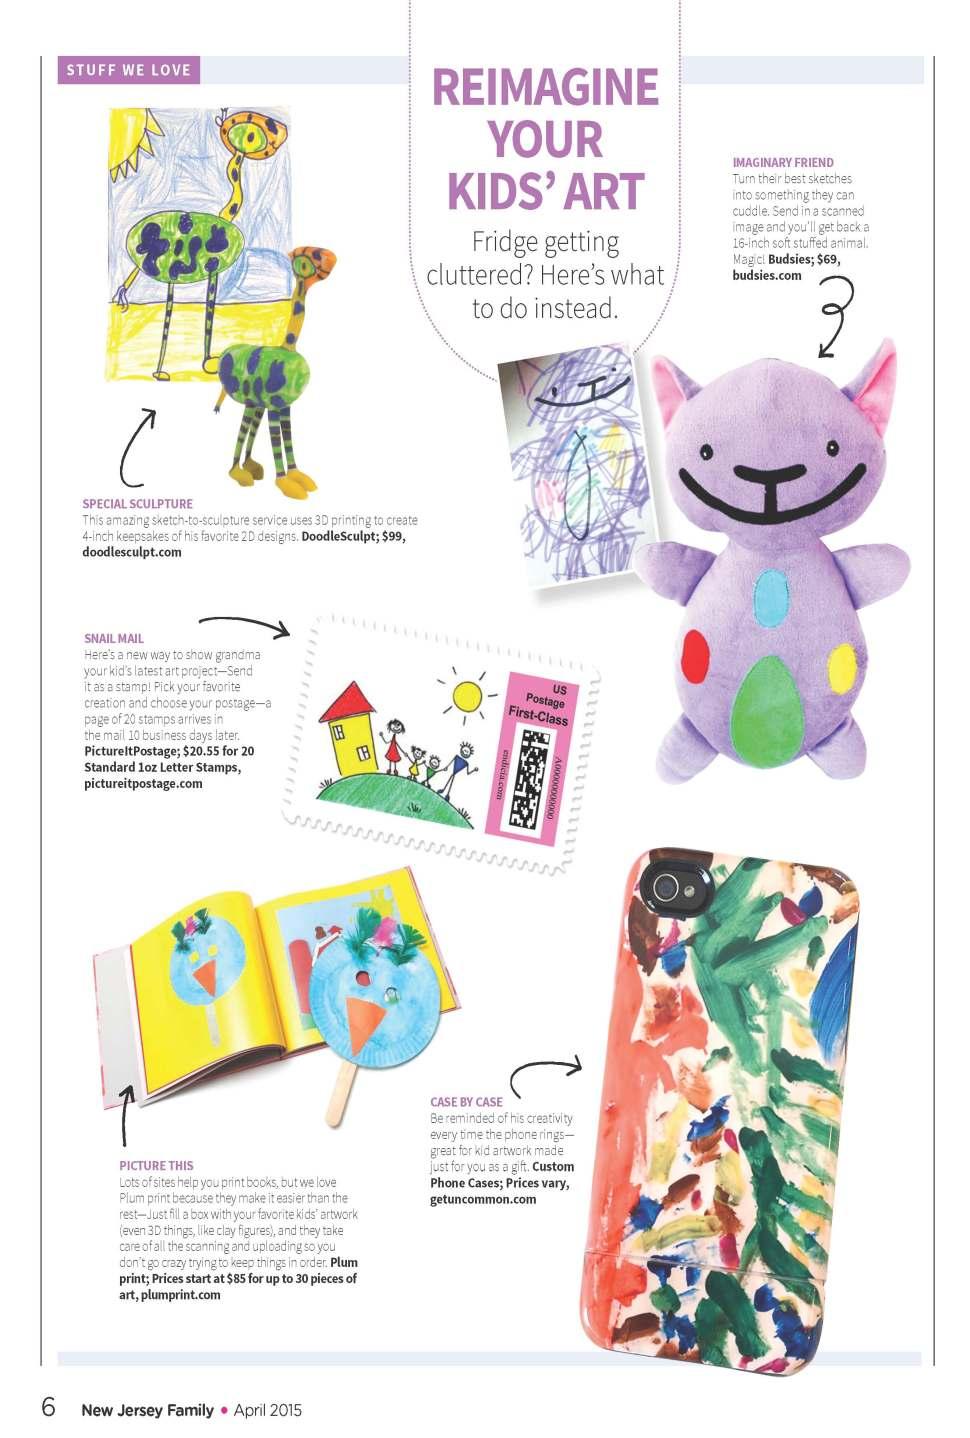 Reimagined Kids Art